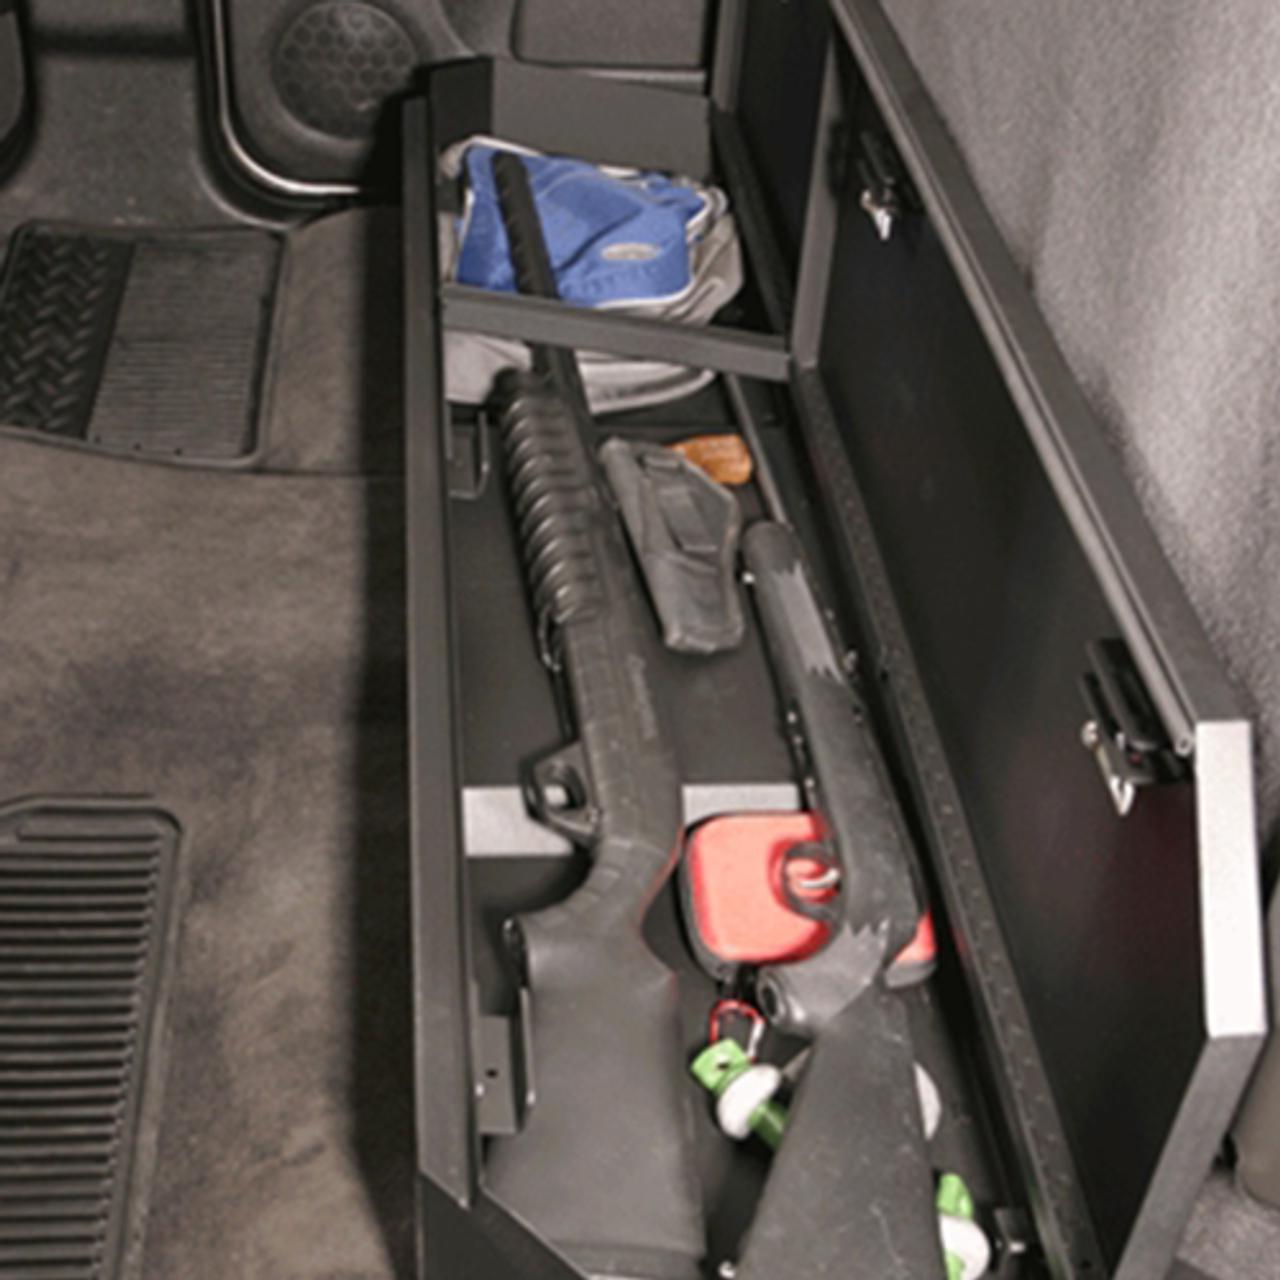 Fabulous Chevy Silverado Rear Seat Storage Organizer Lock Box Pdpeps Interior Chair Design Pdpepsorg